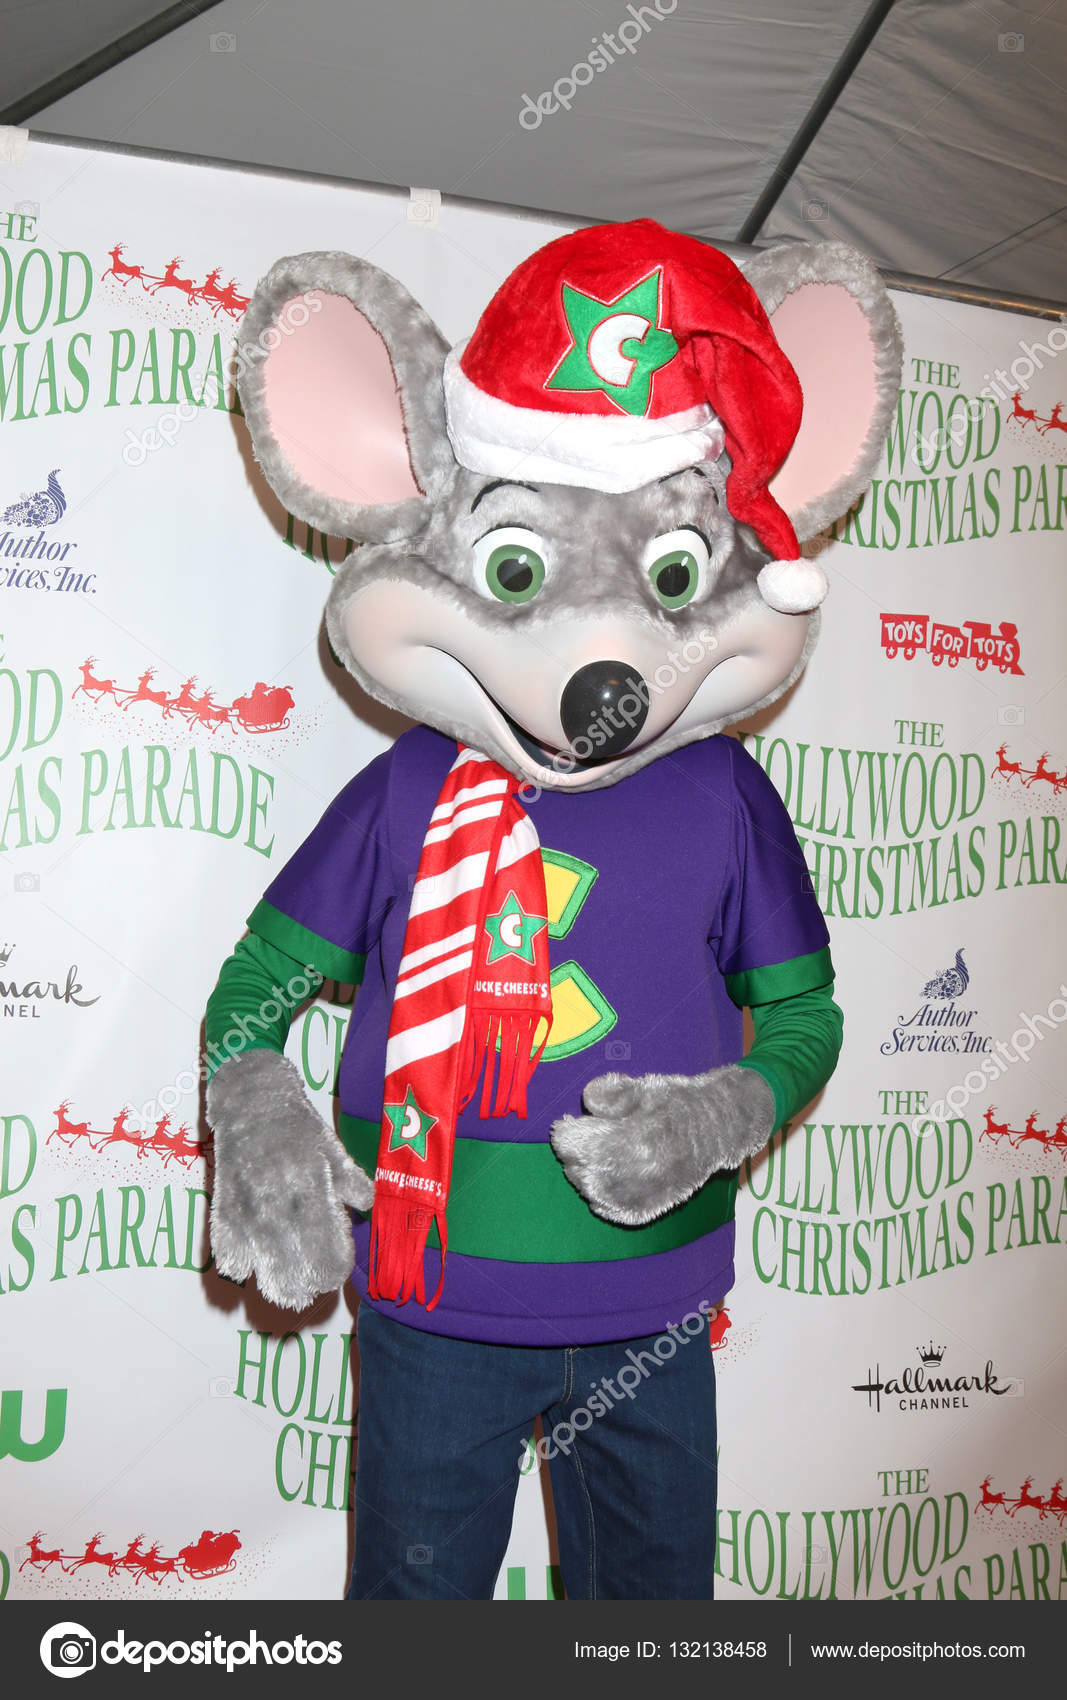 Chuck E Cheese Christmas.Chuck E Cheese At The 85th Annual Hollywood Christmas